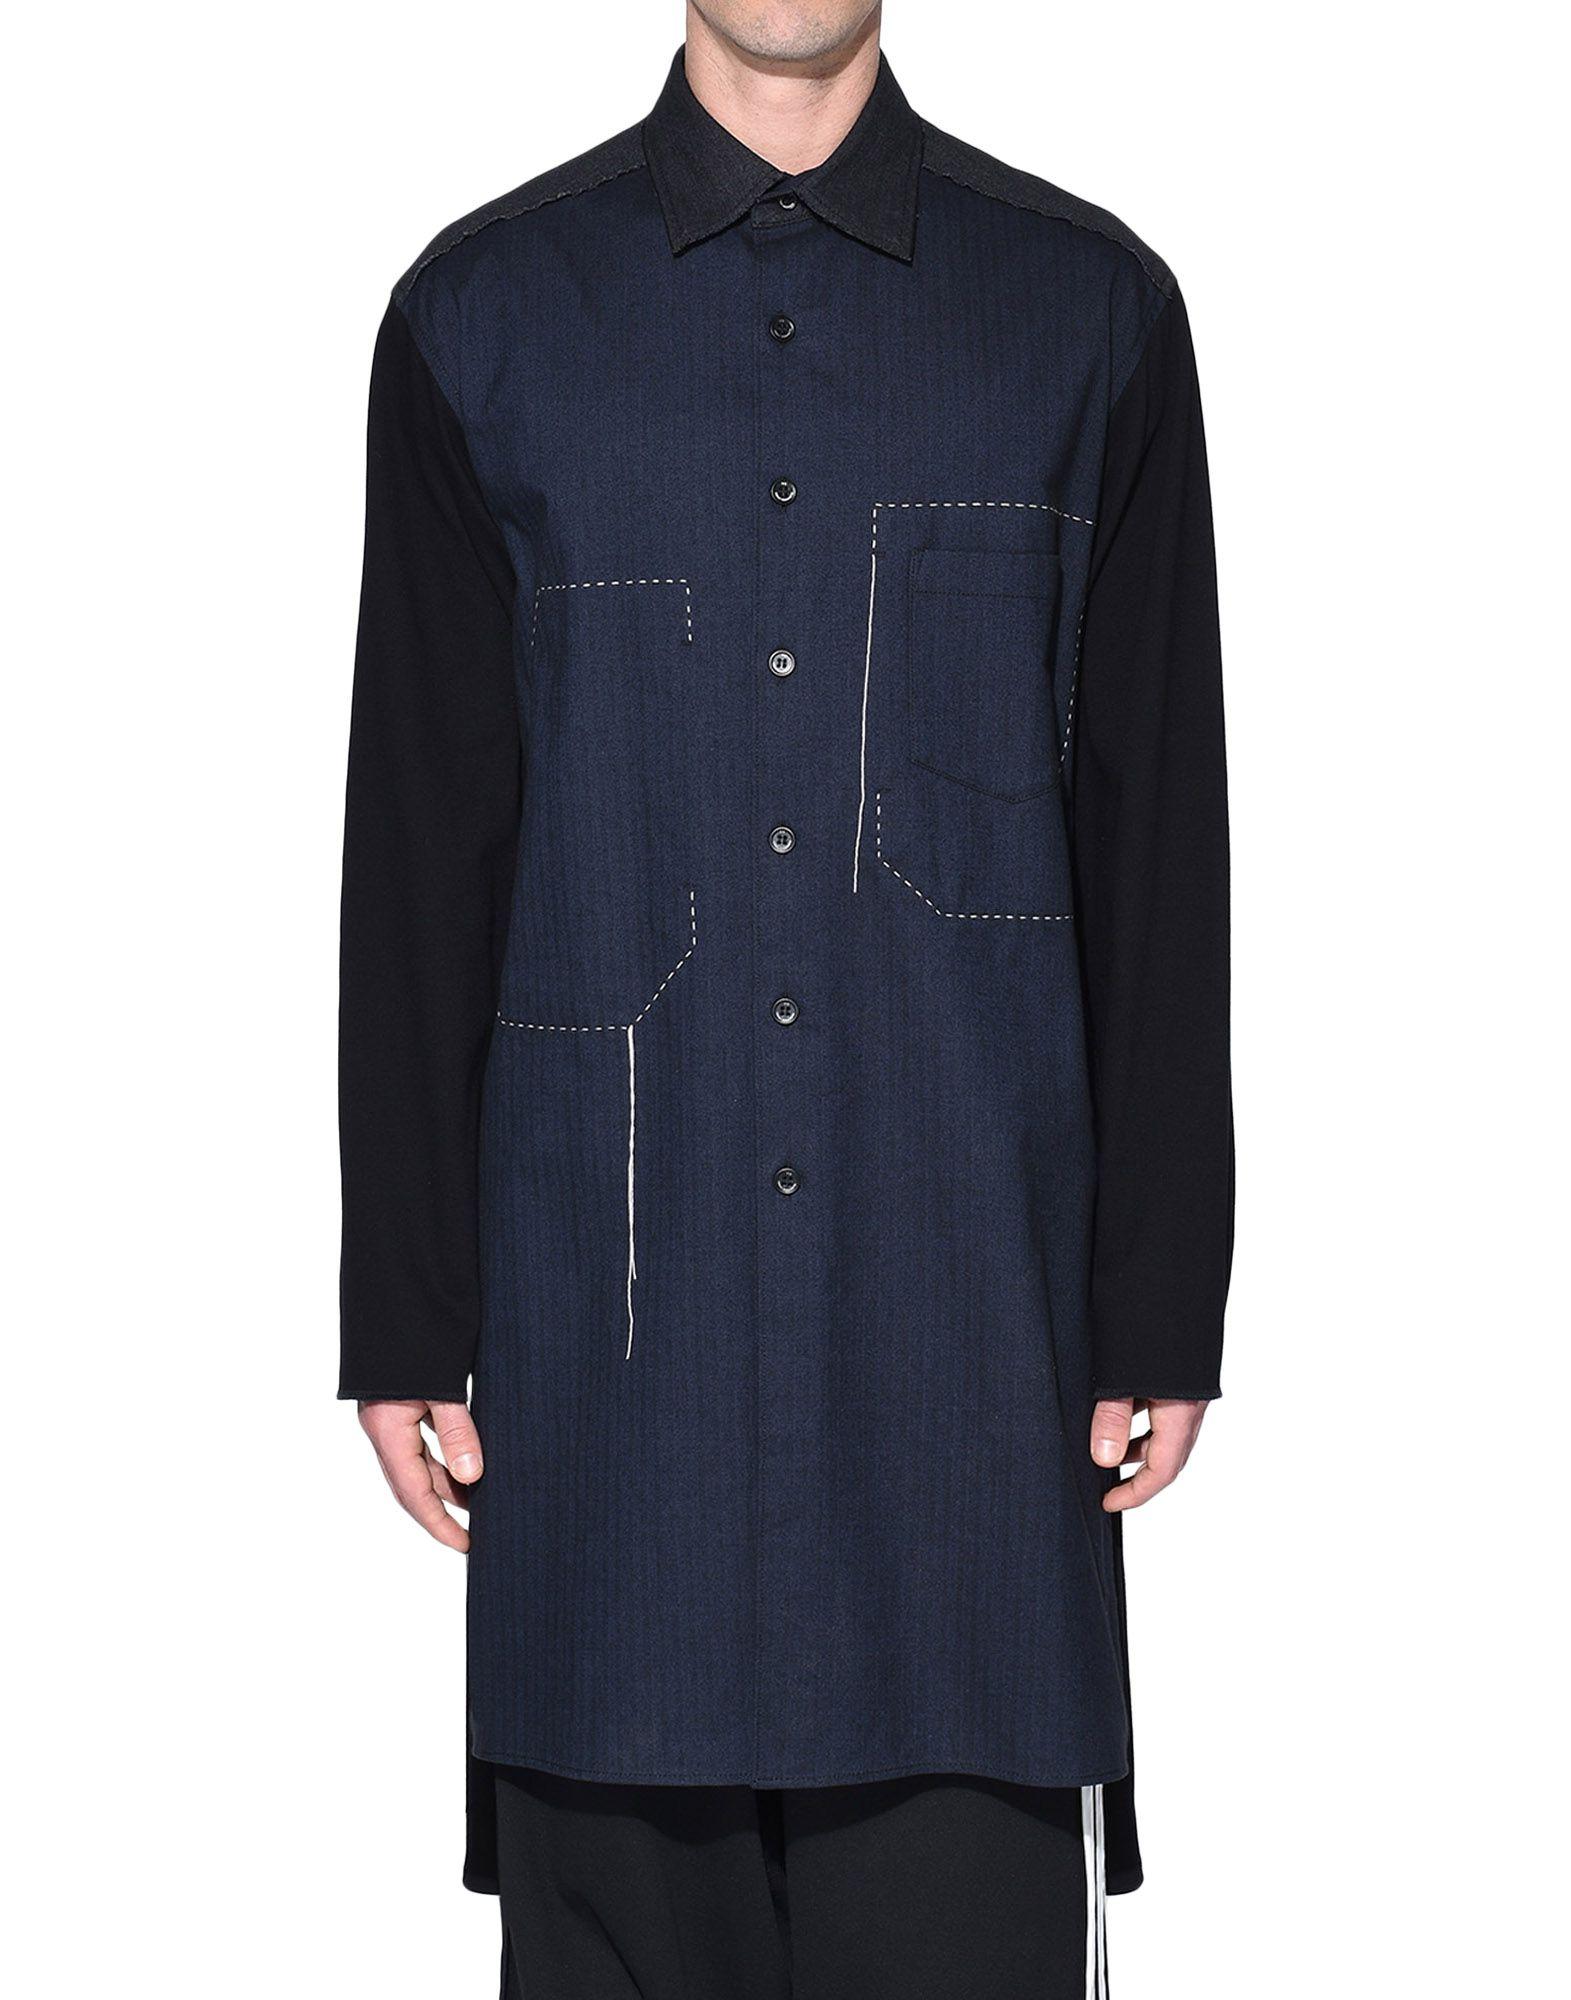 Y-3 Y-3 Herringbone Long Shirt Long sleeve shirt Man r